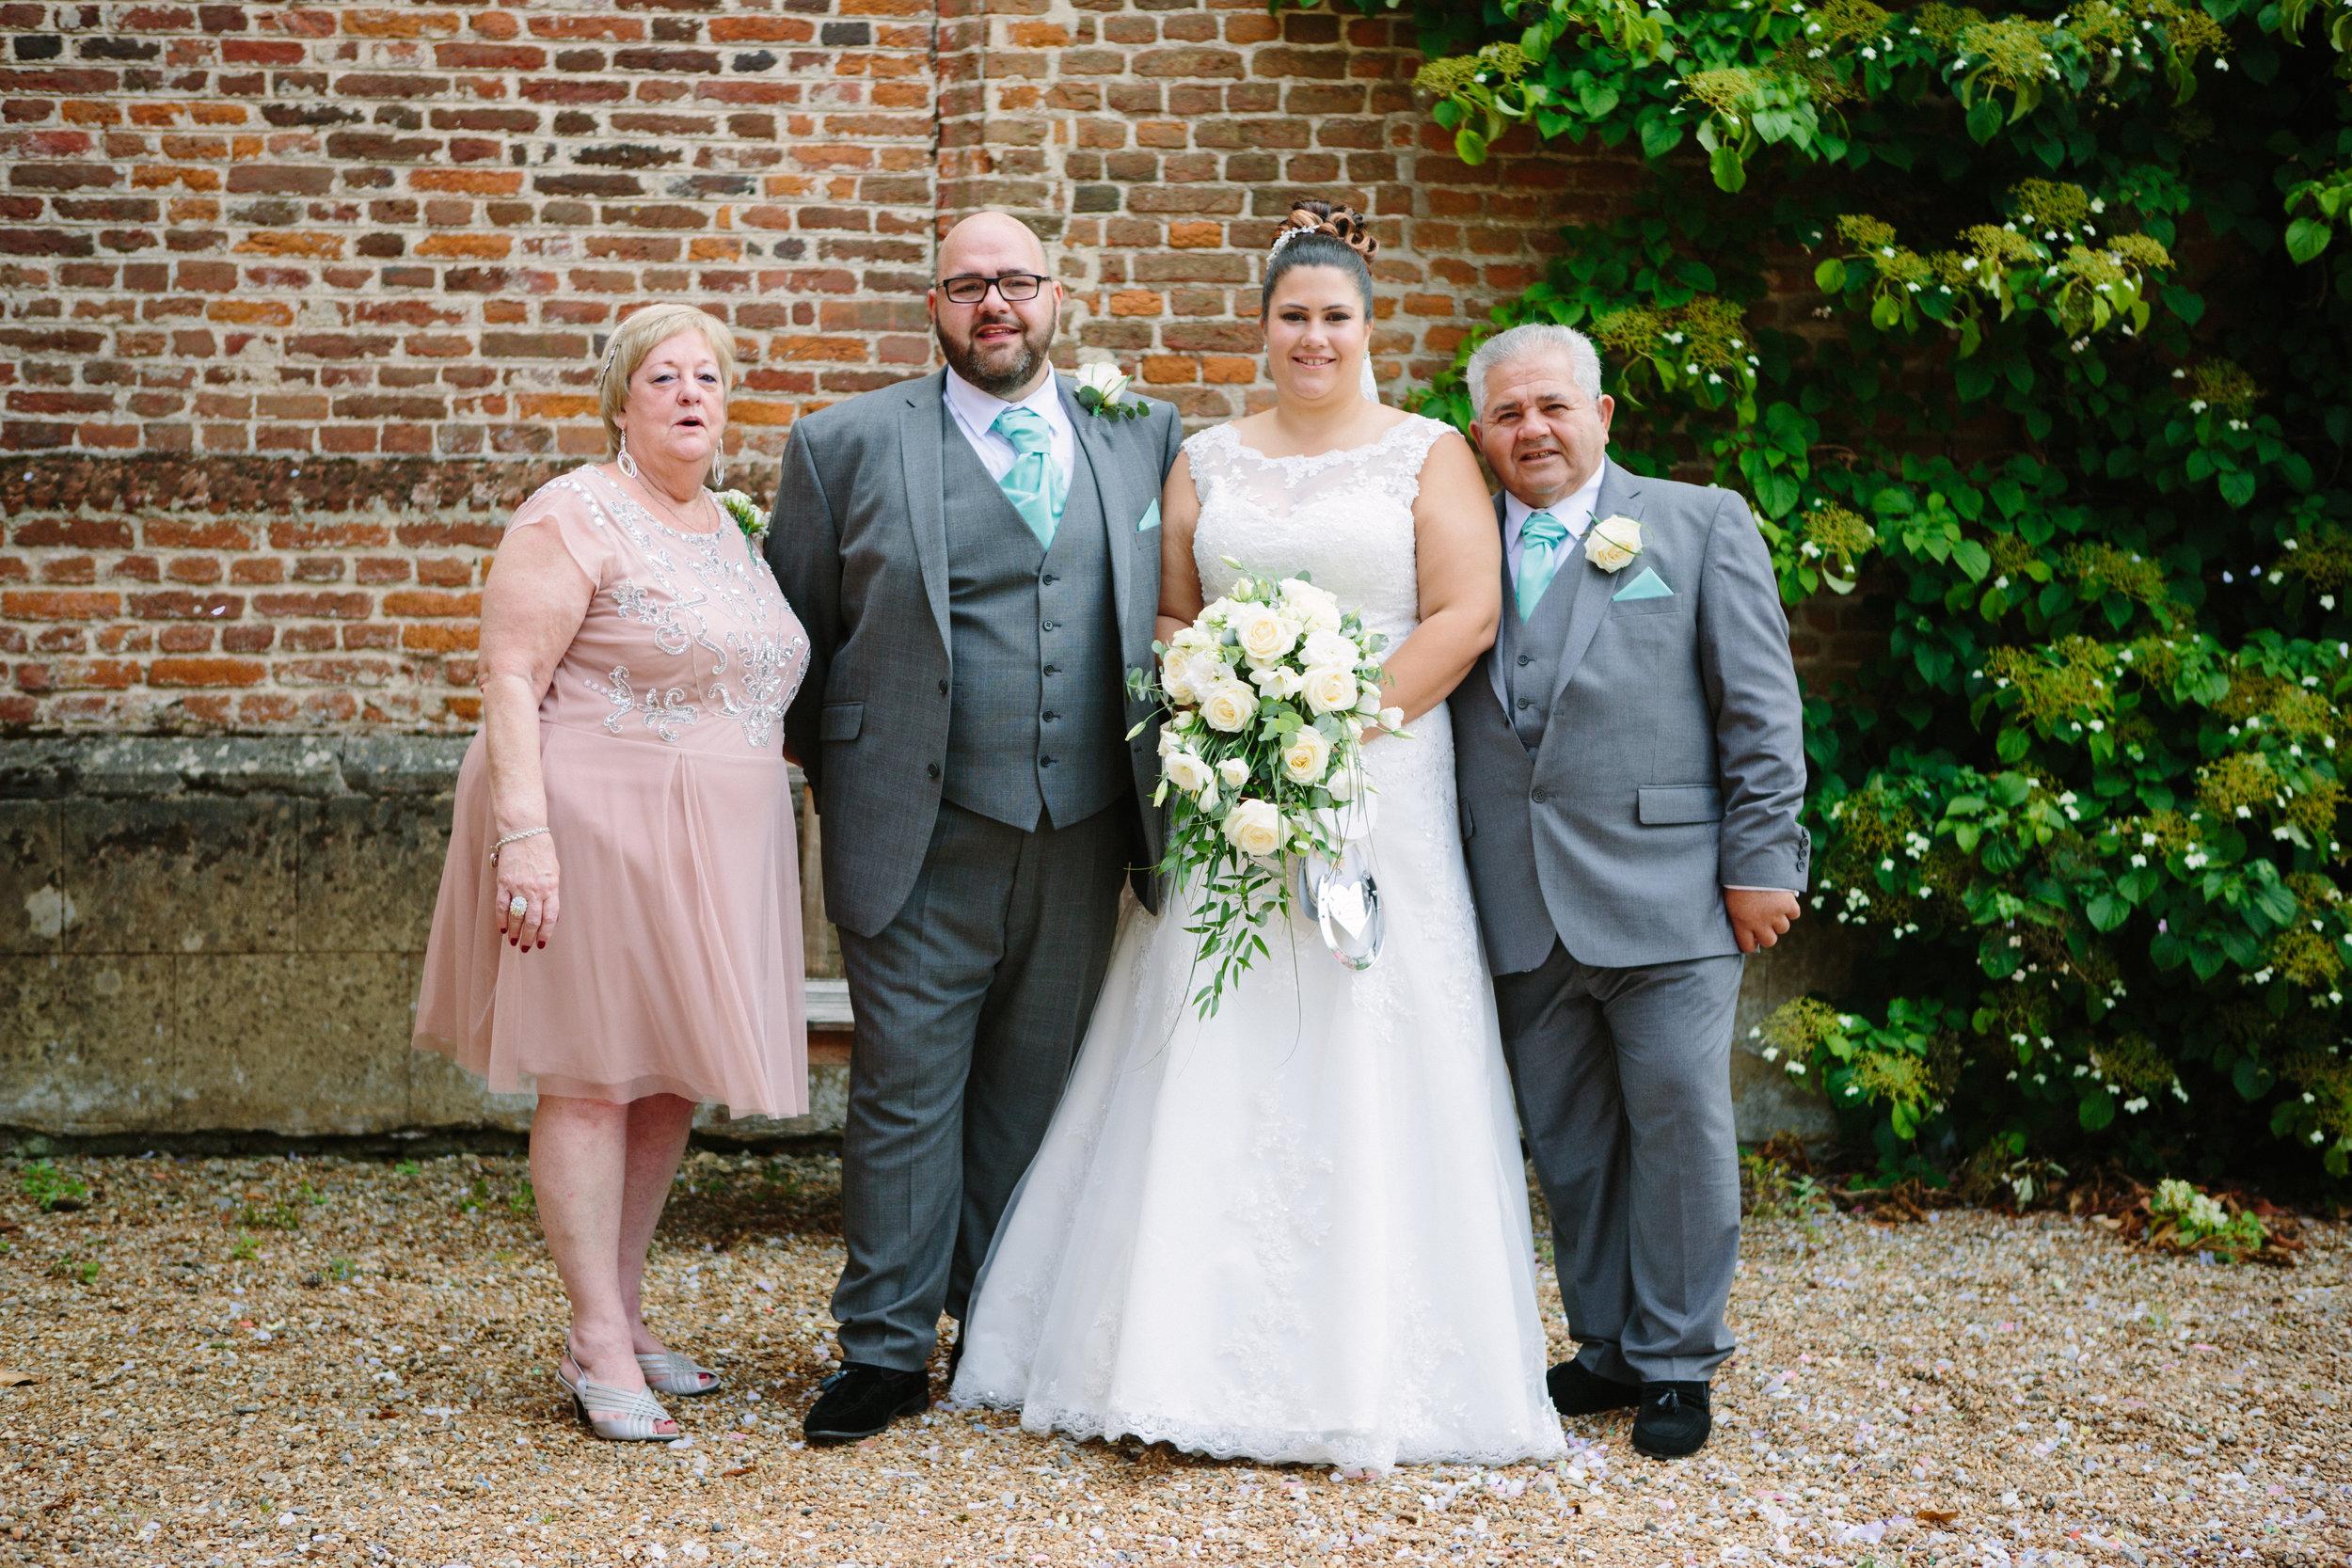 westenhangar-castle-kent-london-wedding-photography-formal-portrait-group-48